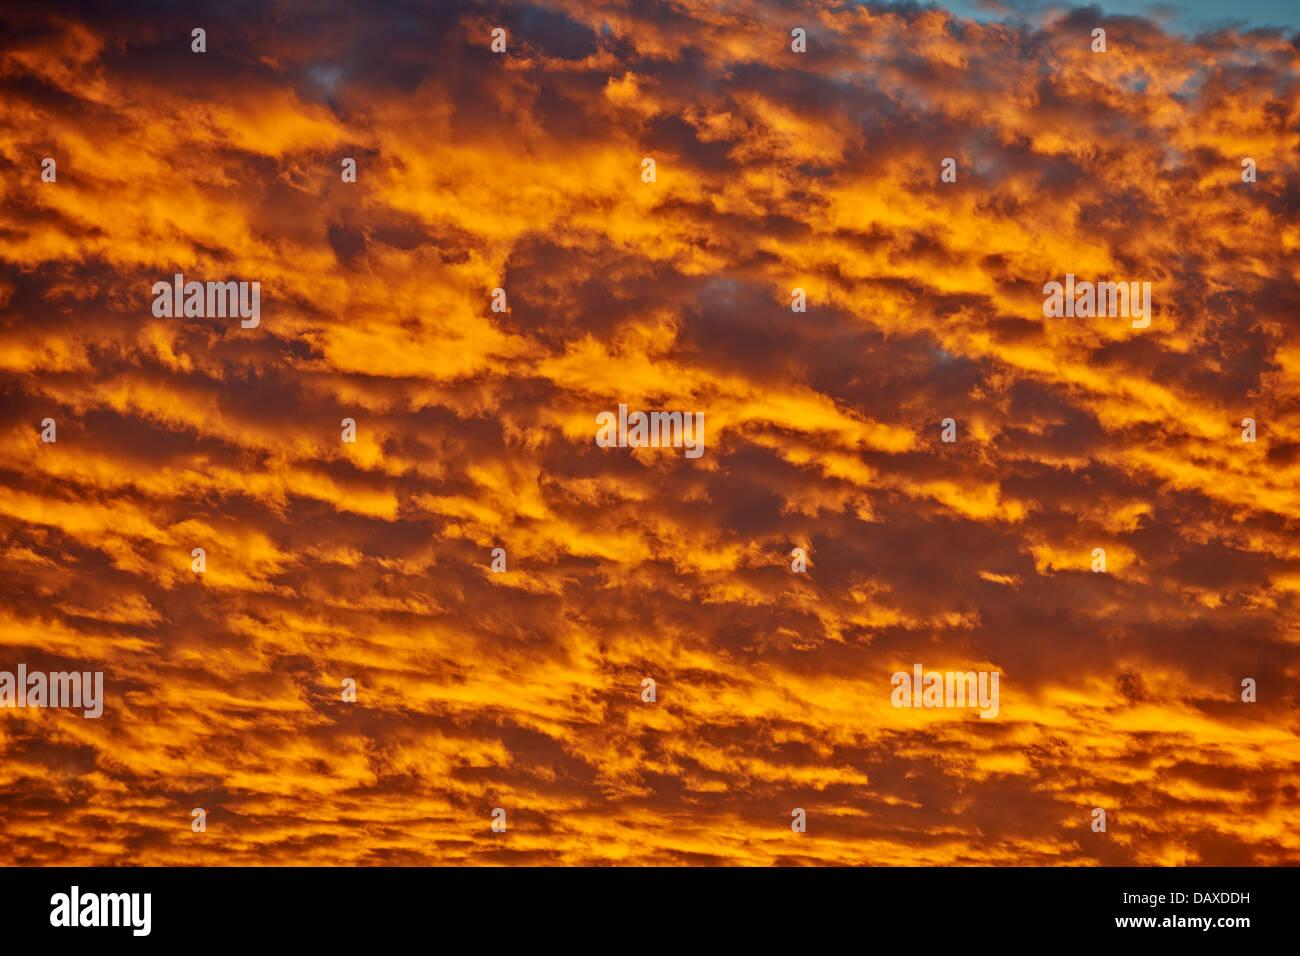 sunset in Central Kalahari Game Reserve, Botswana, Africa - Stock Image